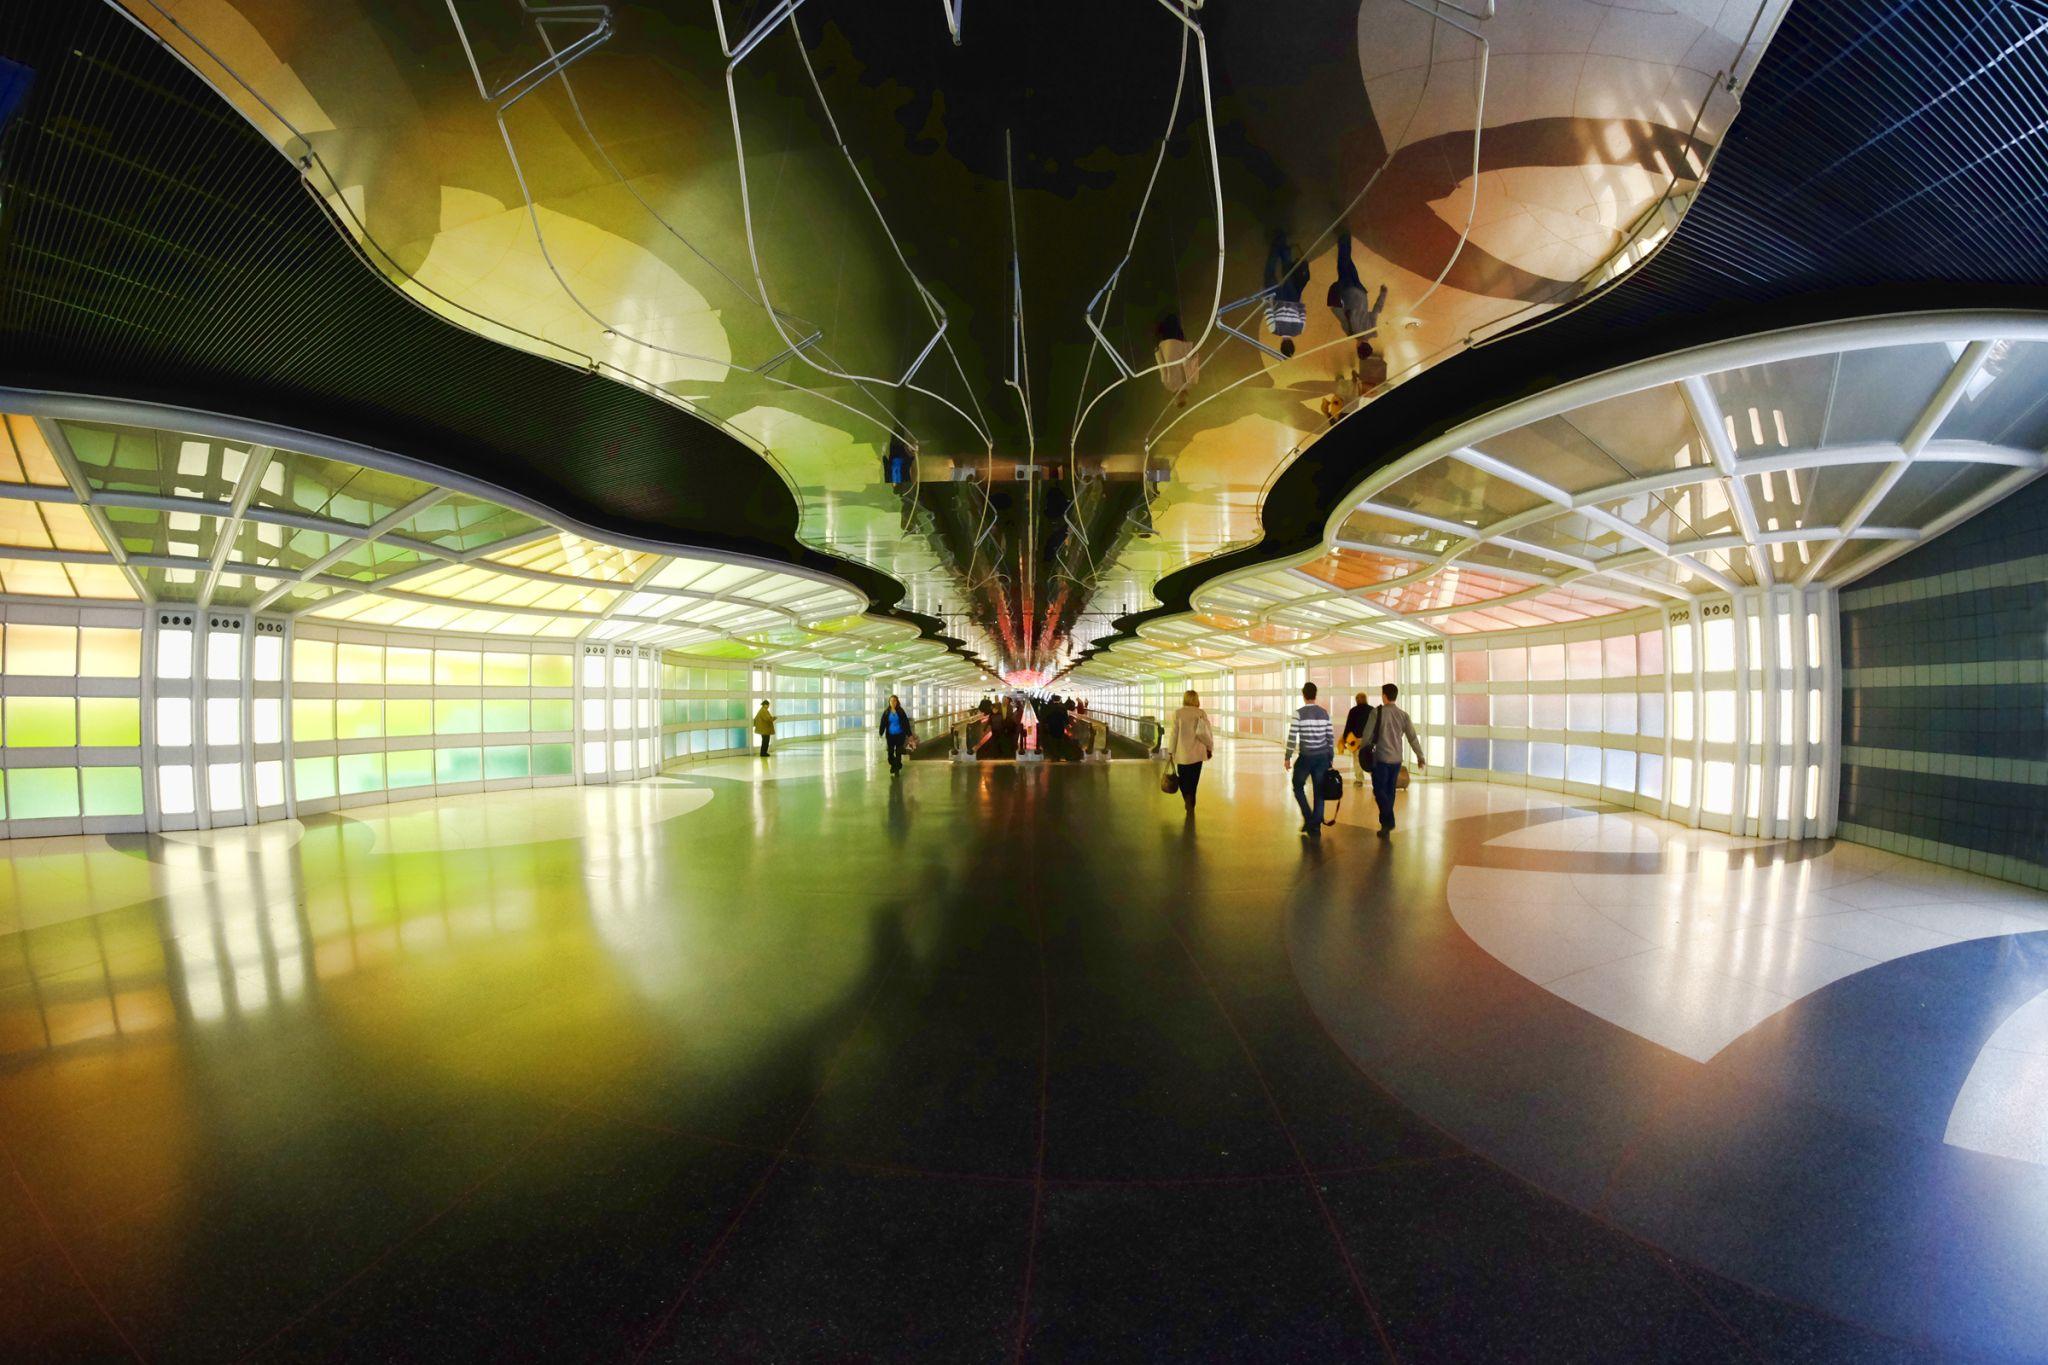 Chicago O'Hare Airport, USA